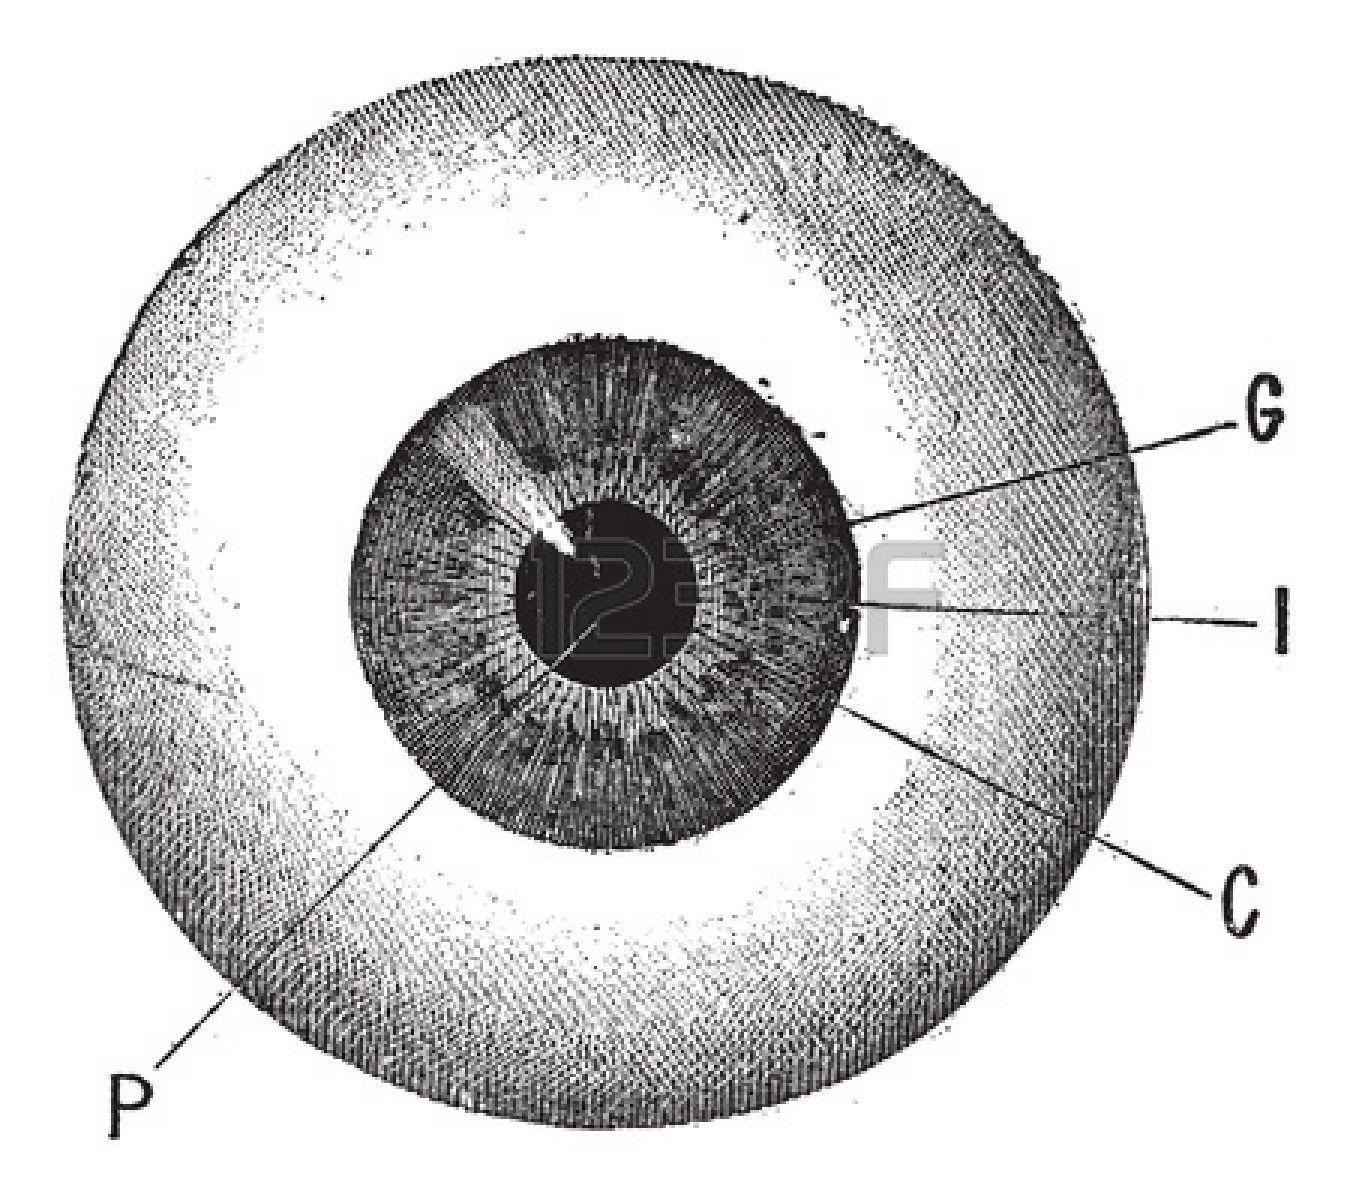 eye anatomy vintage diagram weg motor wiring 3 phase google search bcy24 publicity